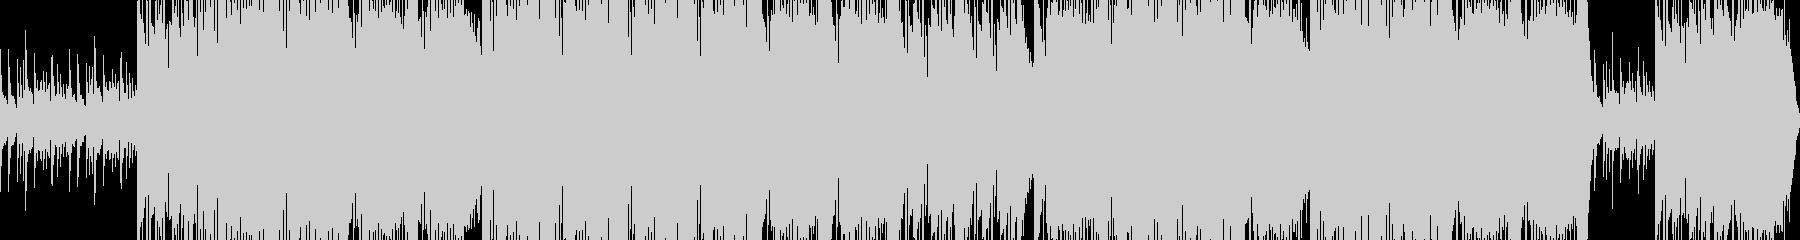 fancyなメロディの未再生の波形